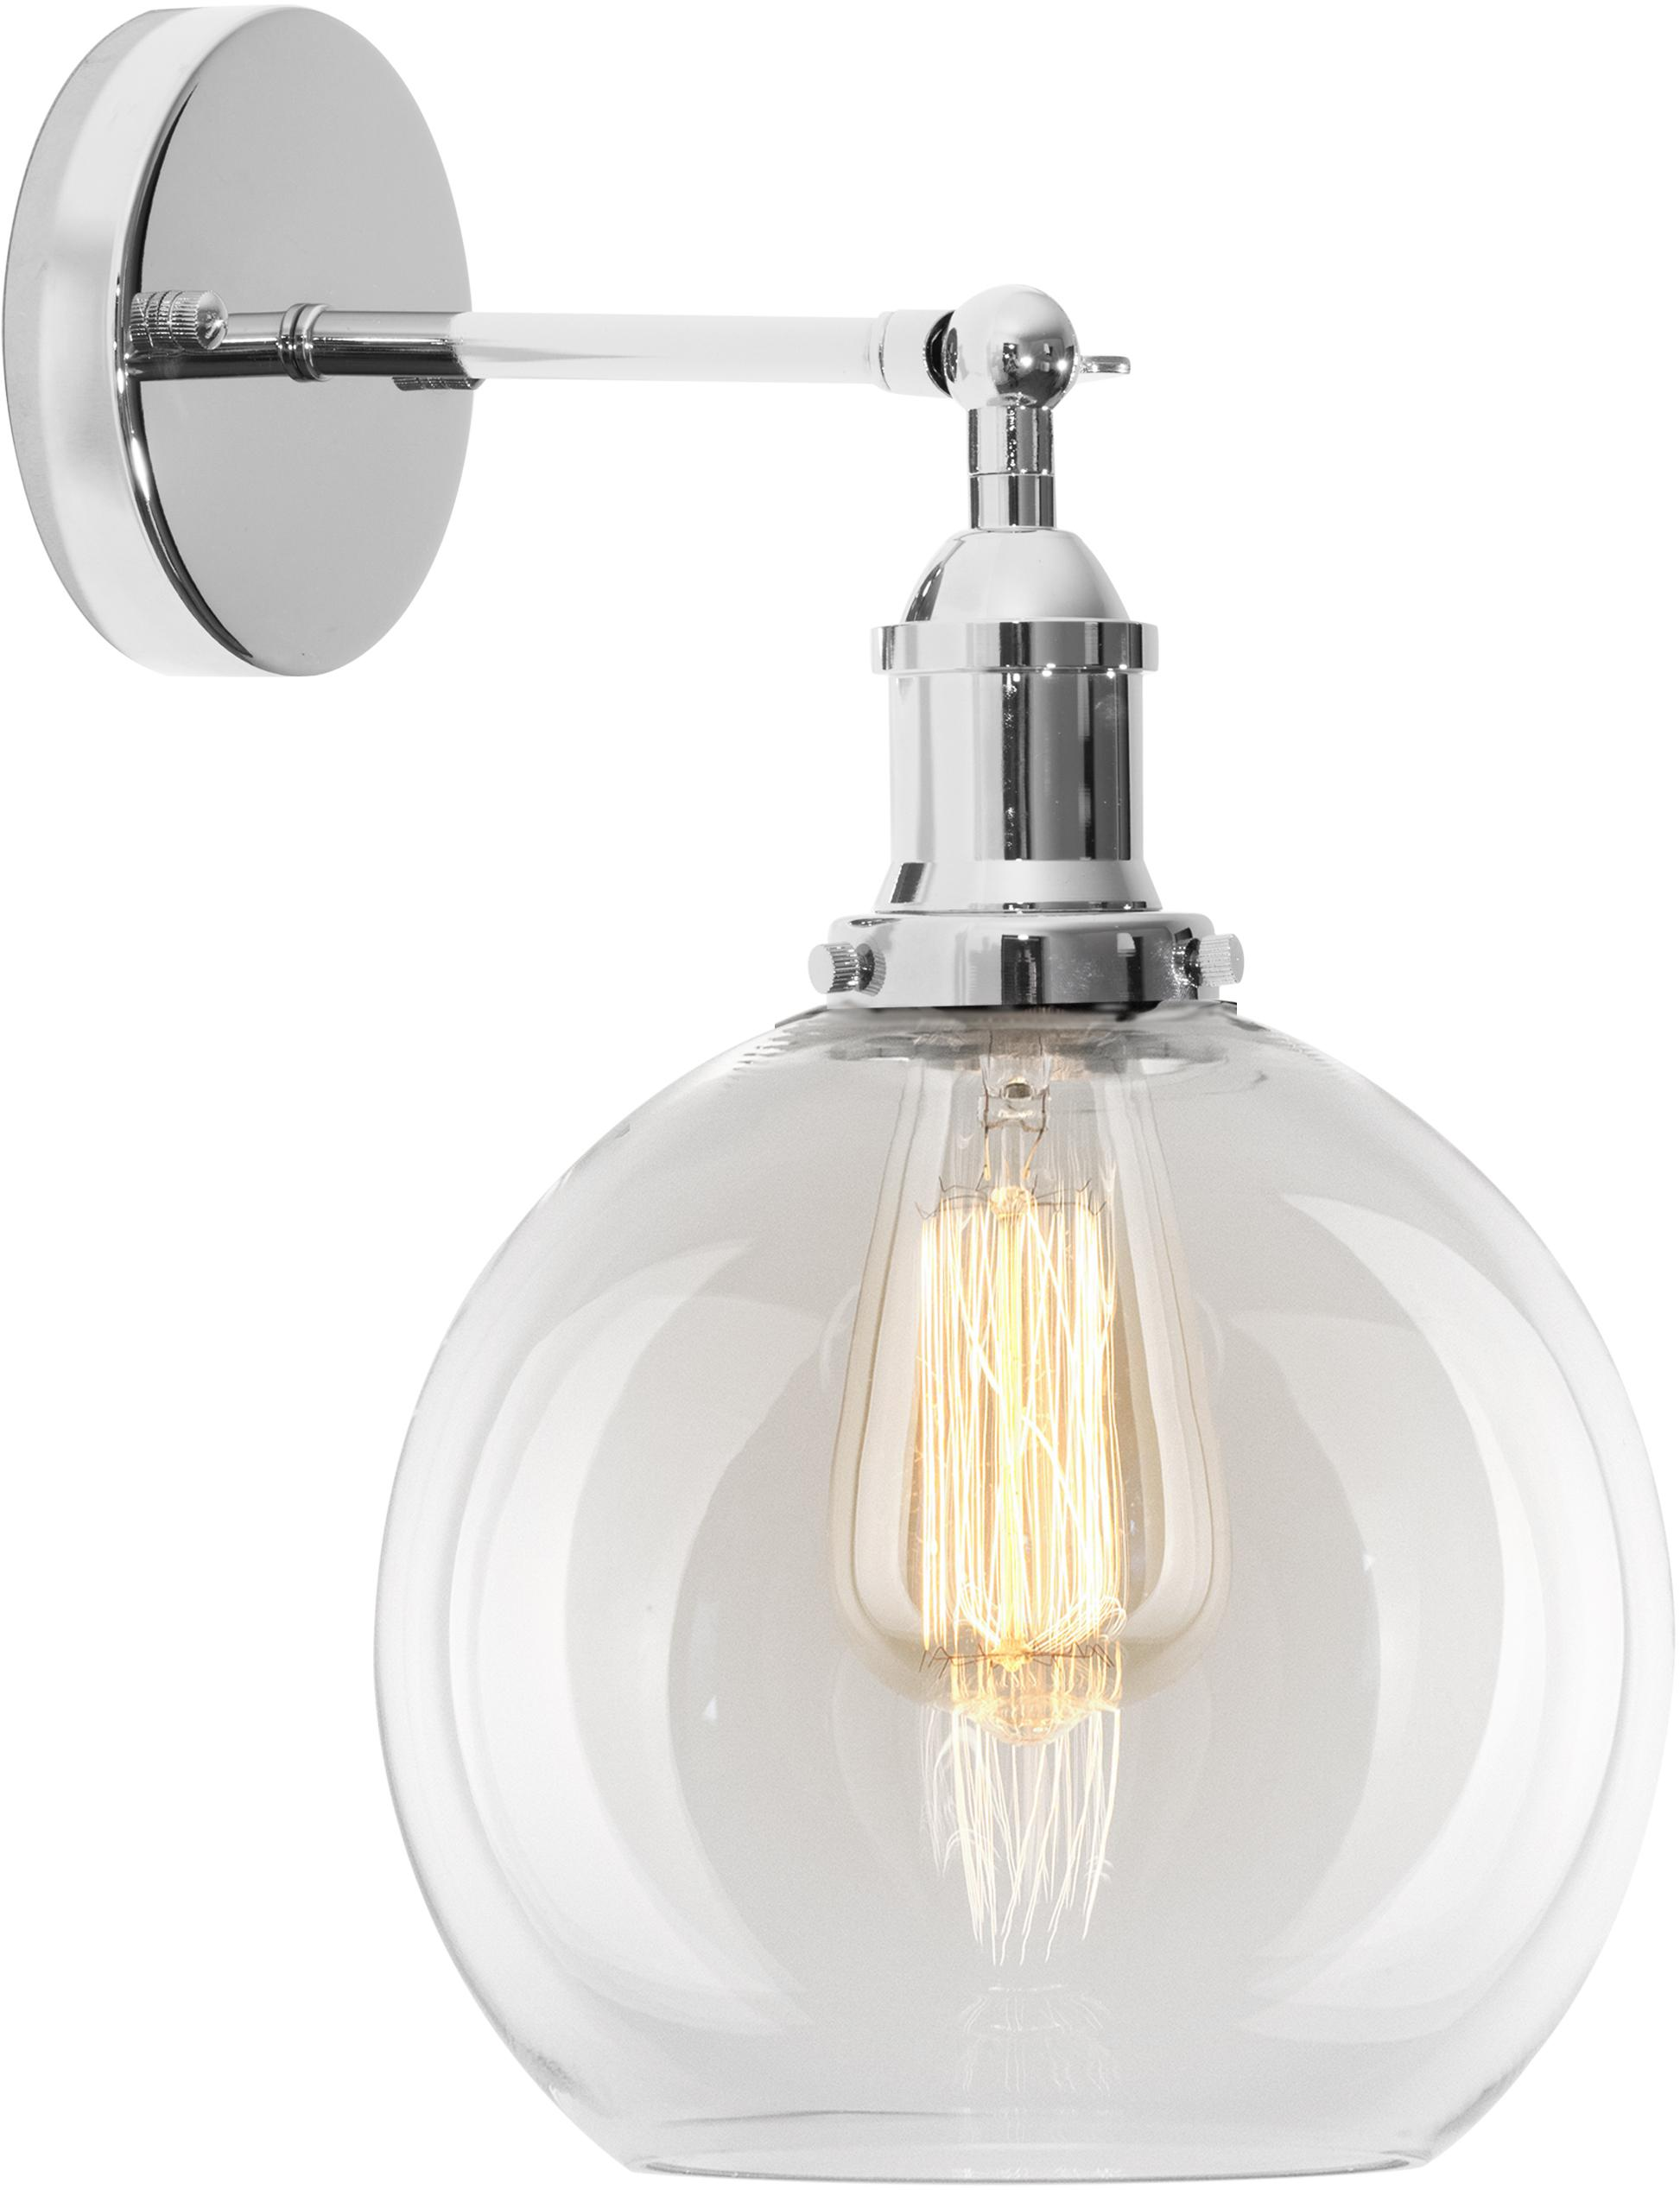 Lampada da parete New York Loft No.2, Paralume: vetro, Cromo, grigio chiaro, Larg. 20 x Alt. 30 cm